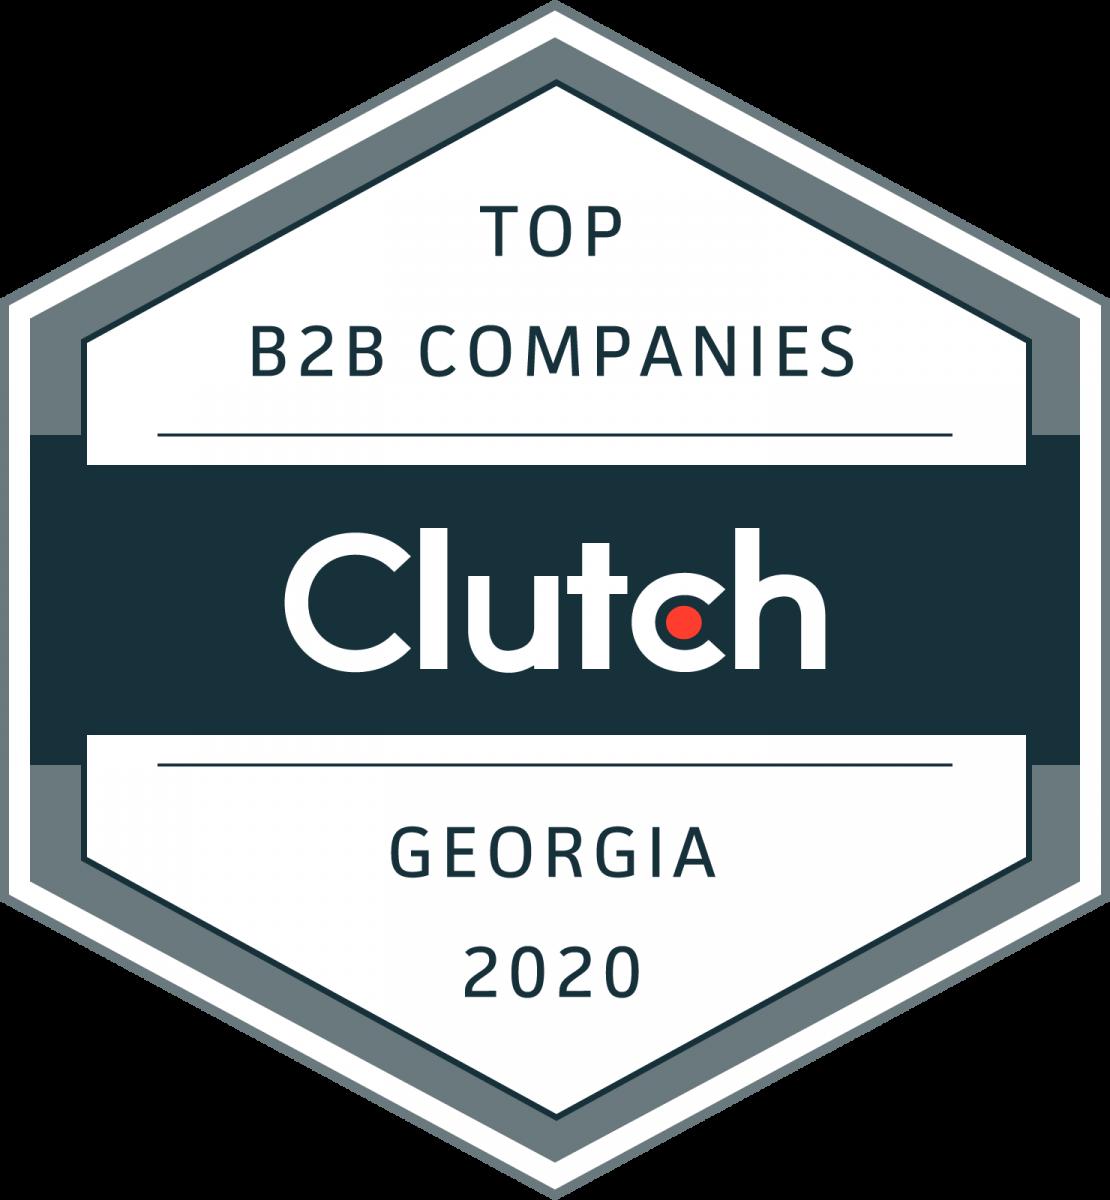 Top B2B Companies Georgia 2020